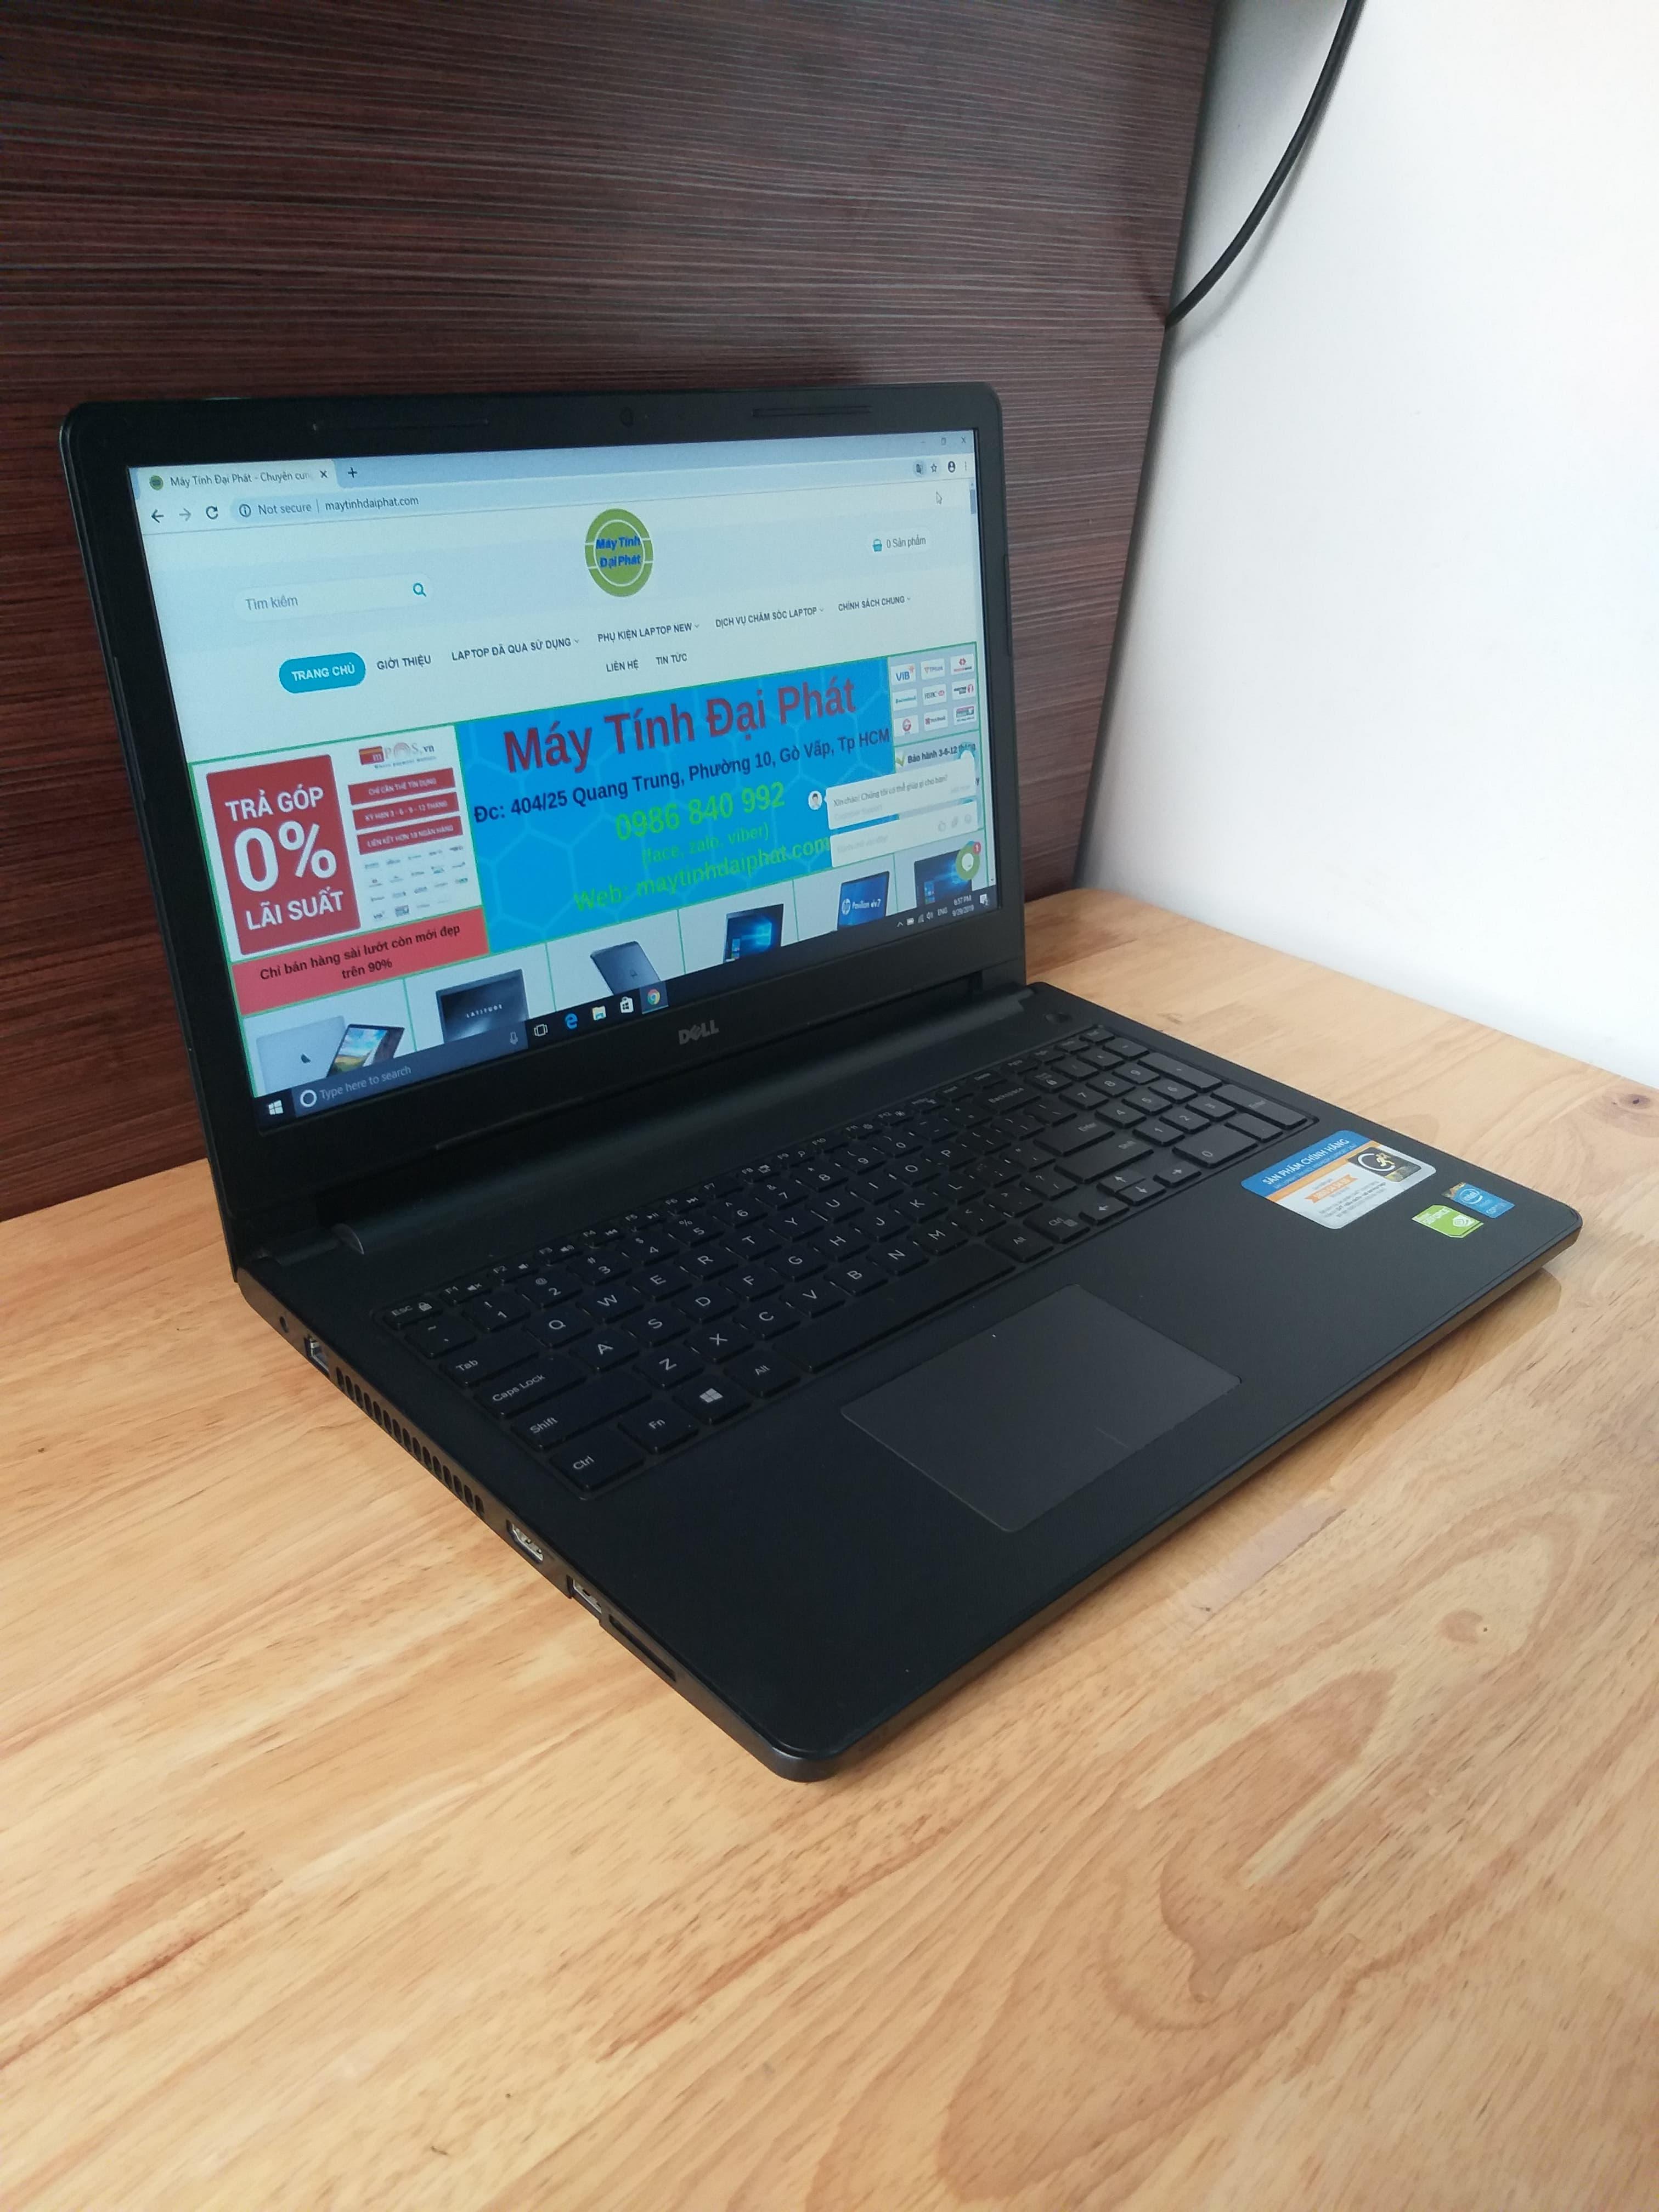 Dell inspiron 3558, I5 5200U RAM 8GB SSD 256GB